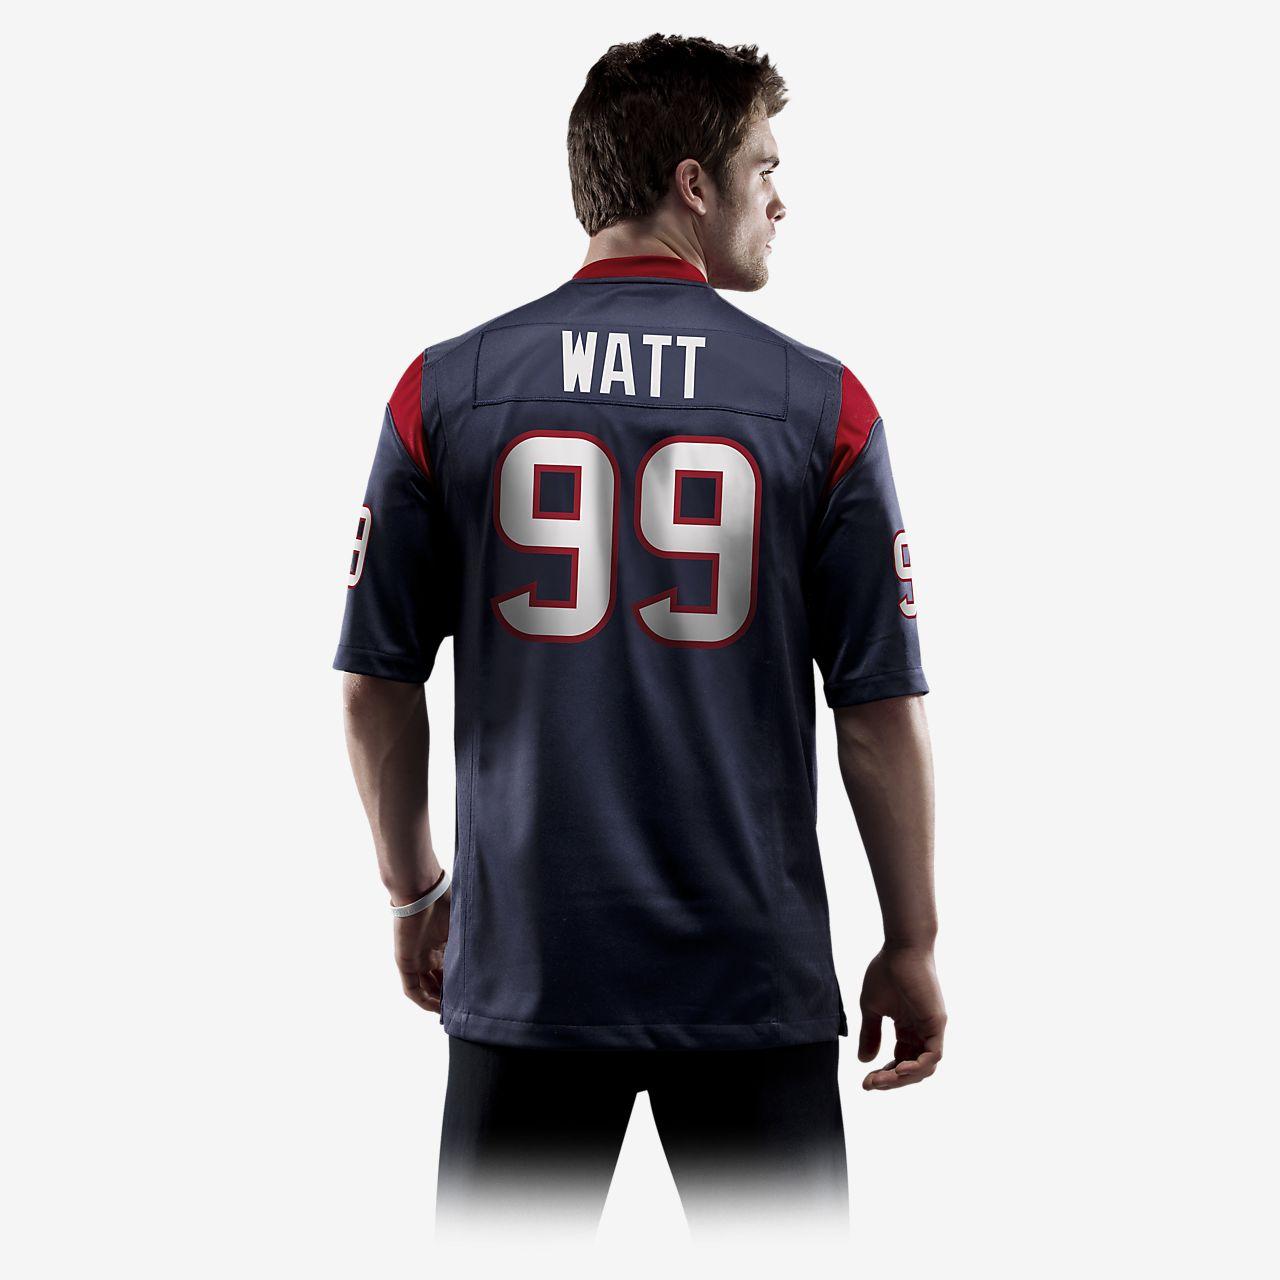 ... NFL Houston Texans (J.J. Watt) Men s American Football Home Game Jersey f055429bb